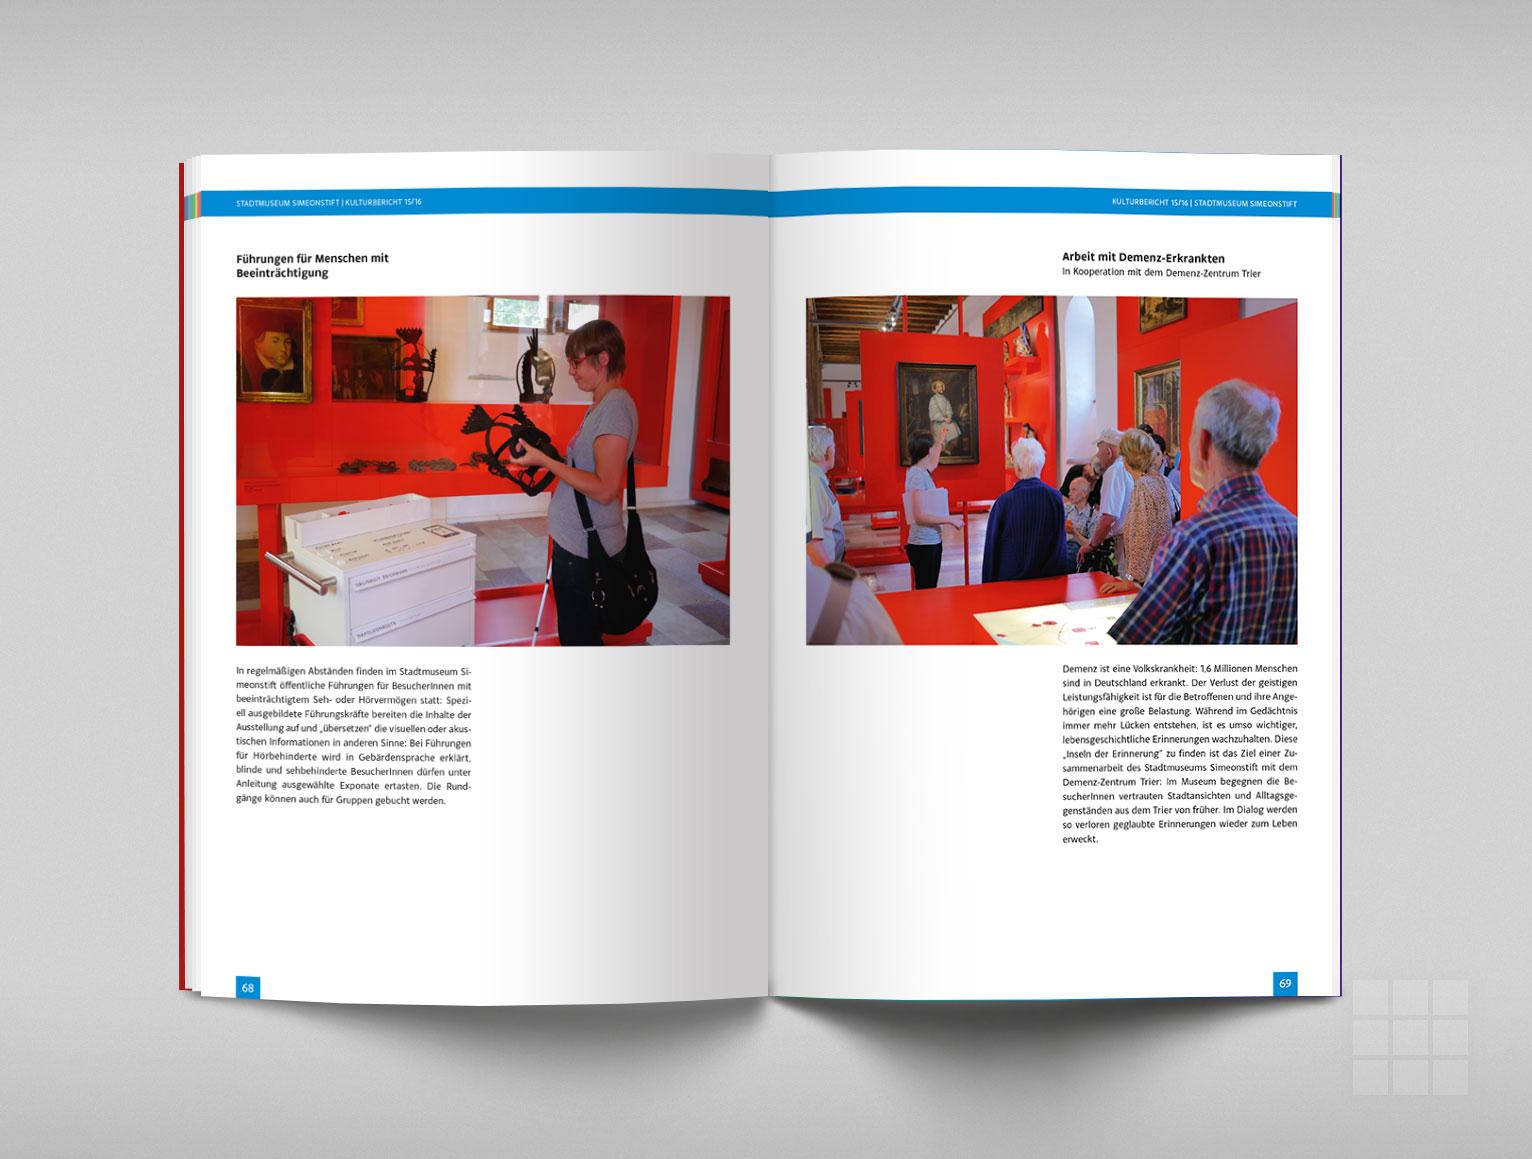 Stadtmuseum simeonstift - Kulturbericht Stadt Trier